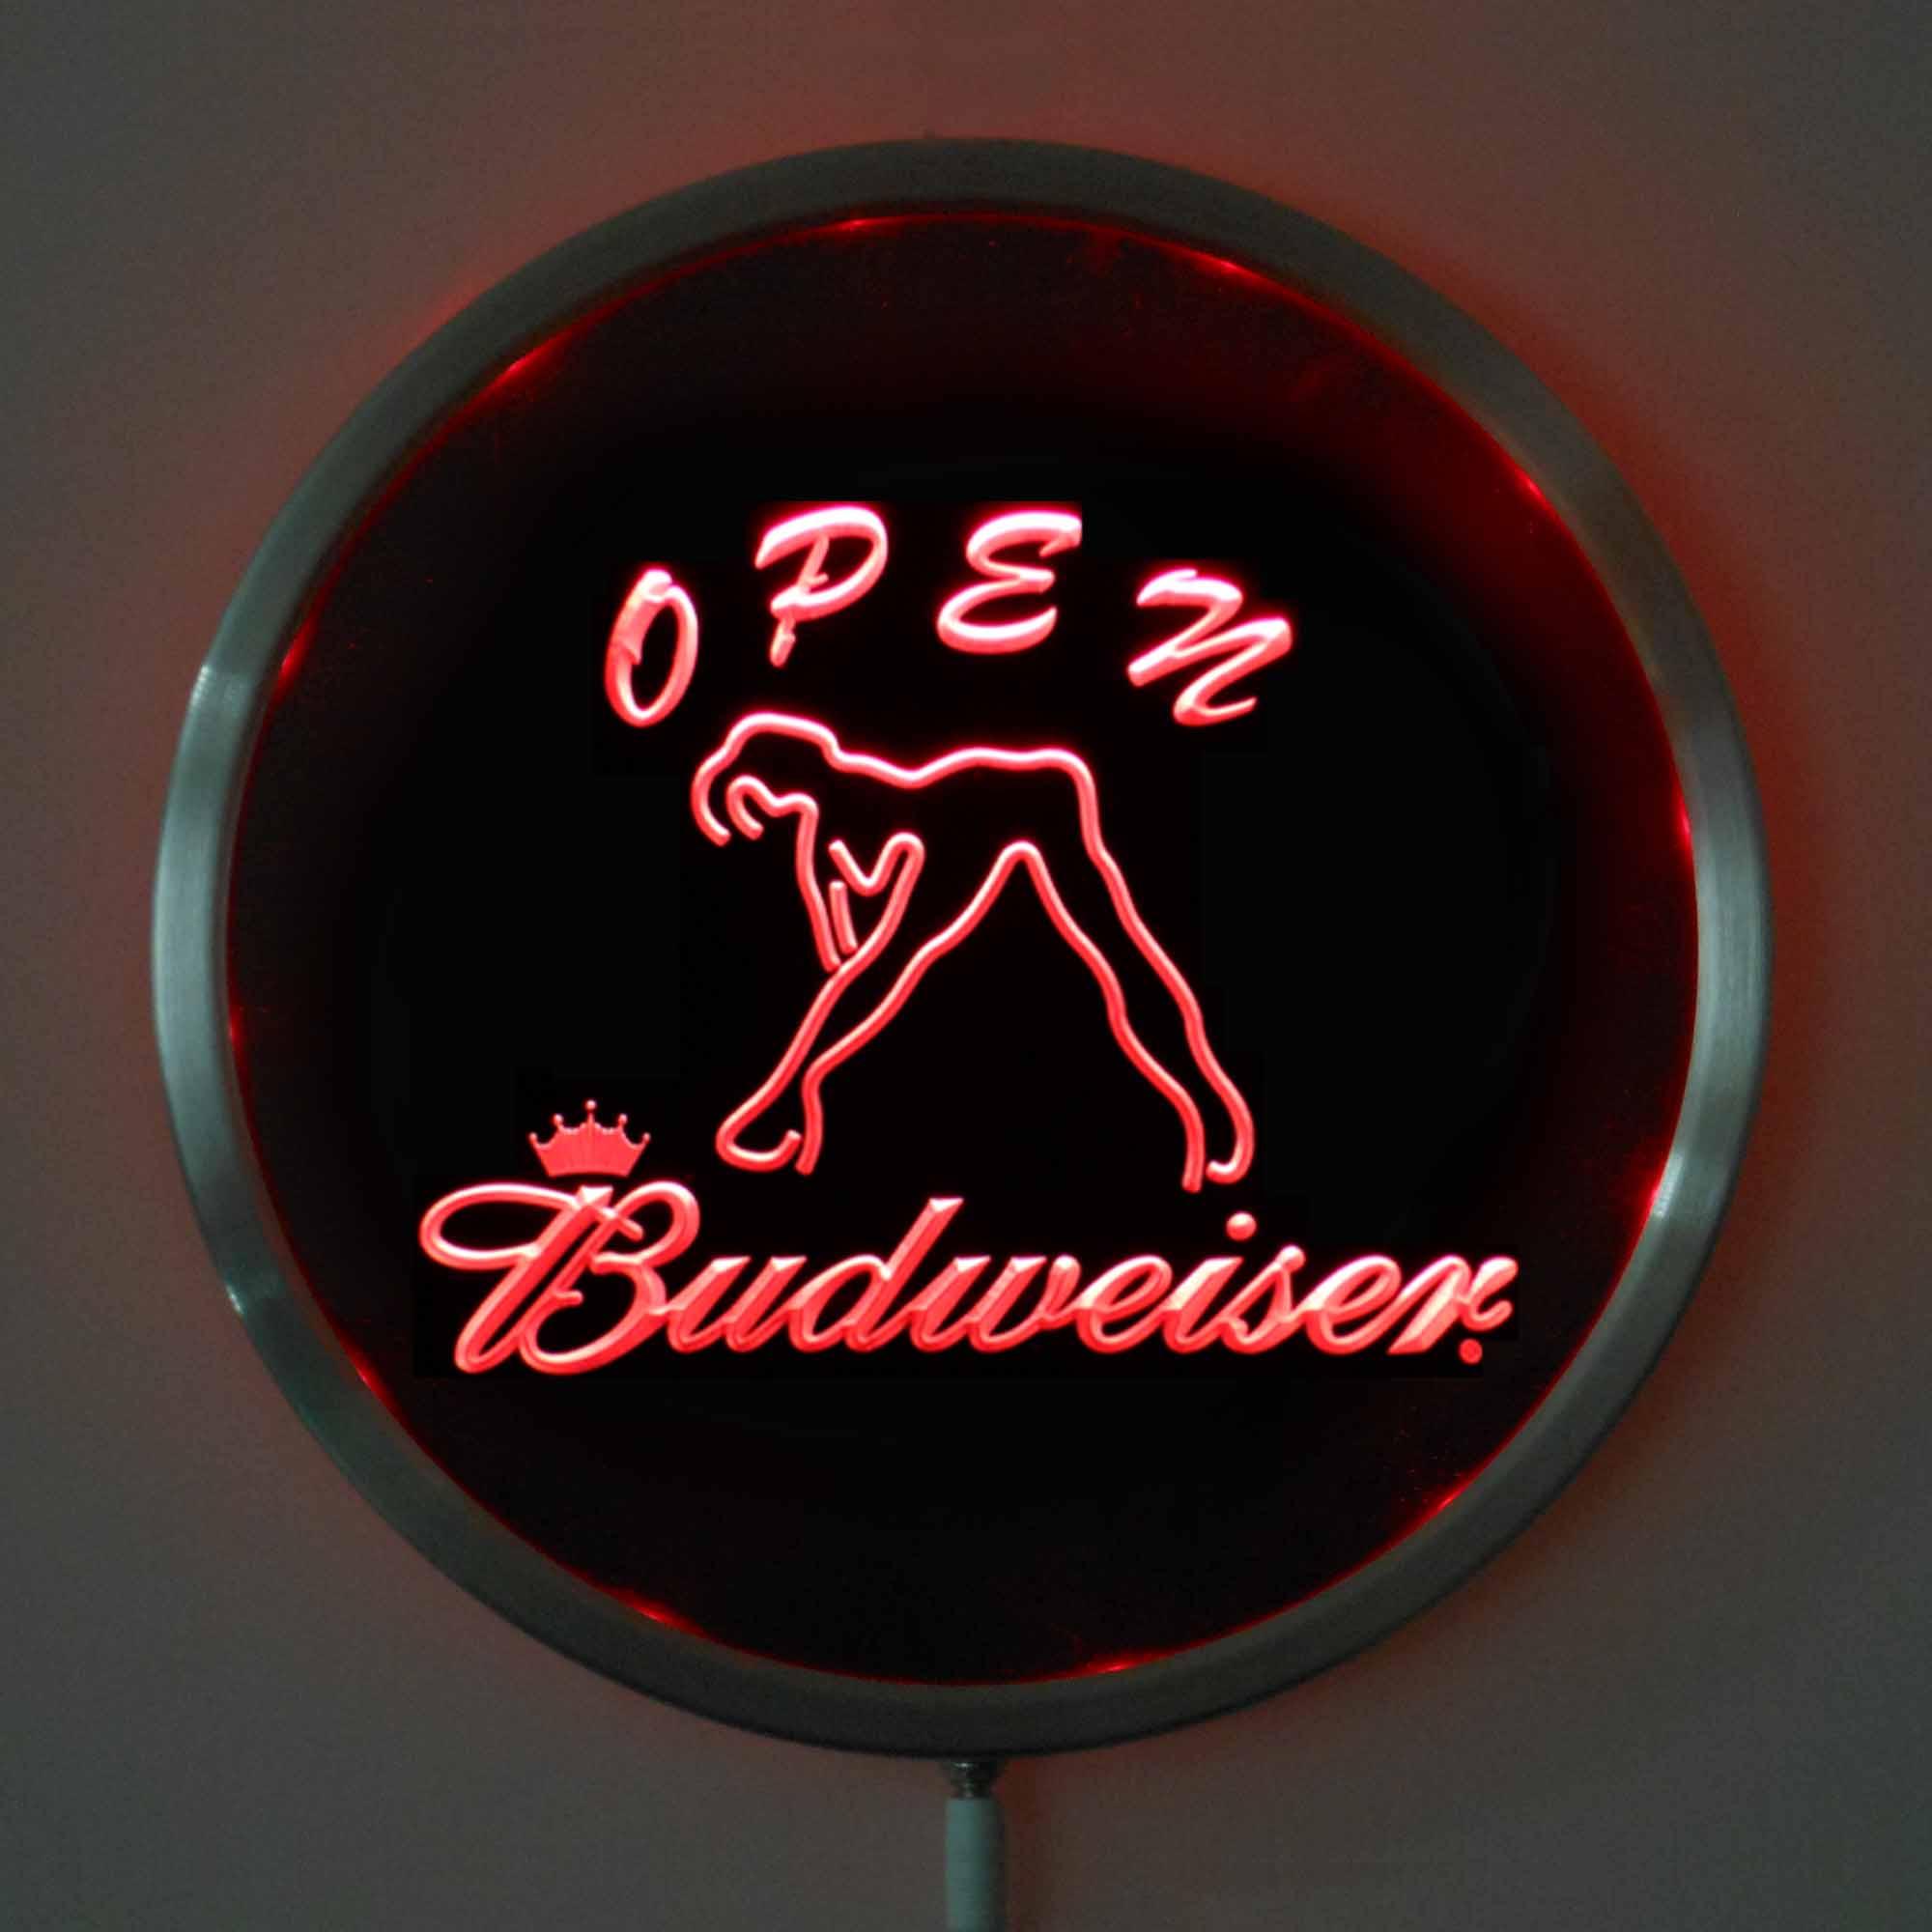 rs 0051 Budweiser Dancer OPEN LED Neon Light Round Signss